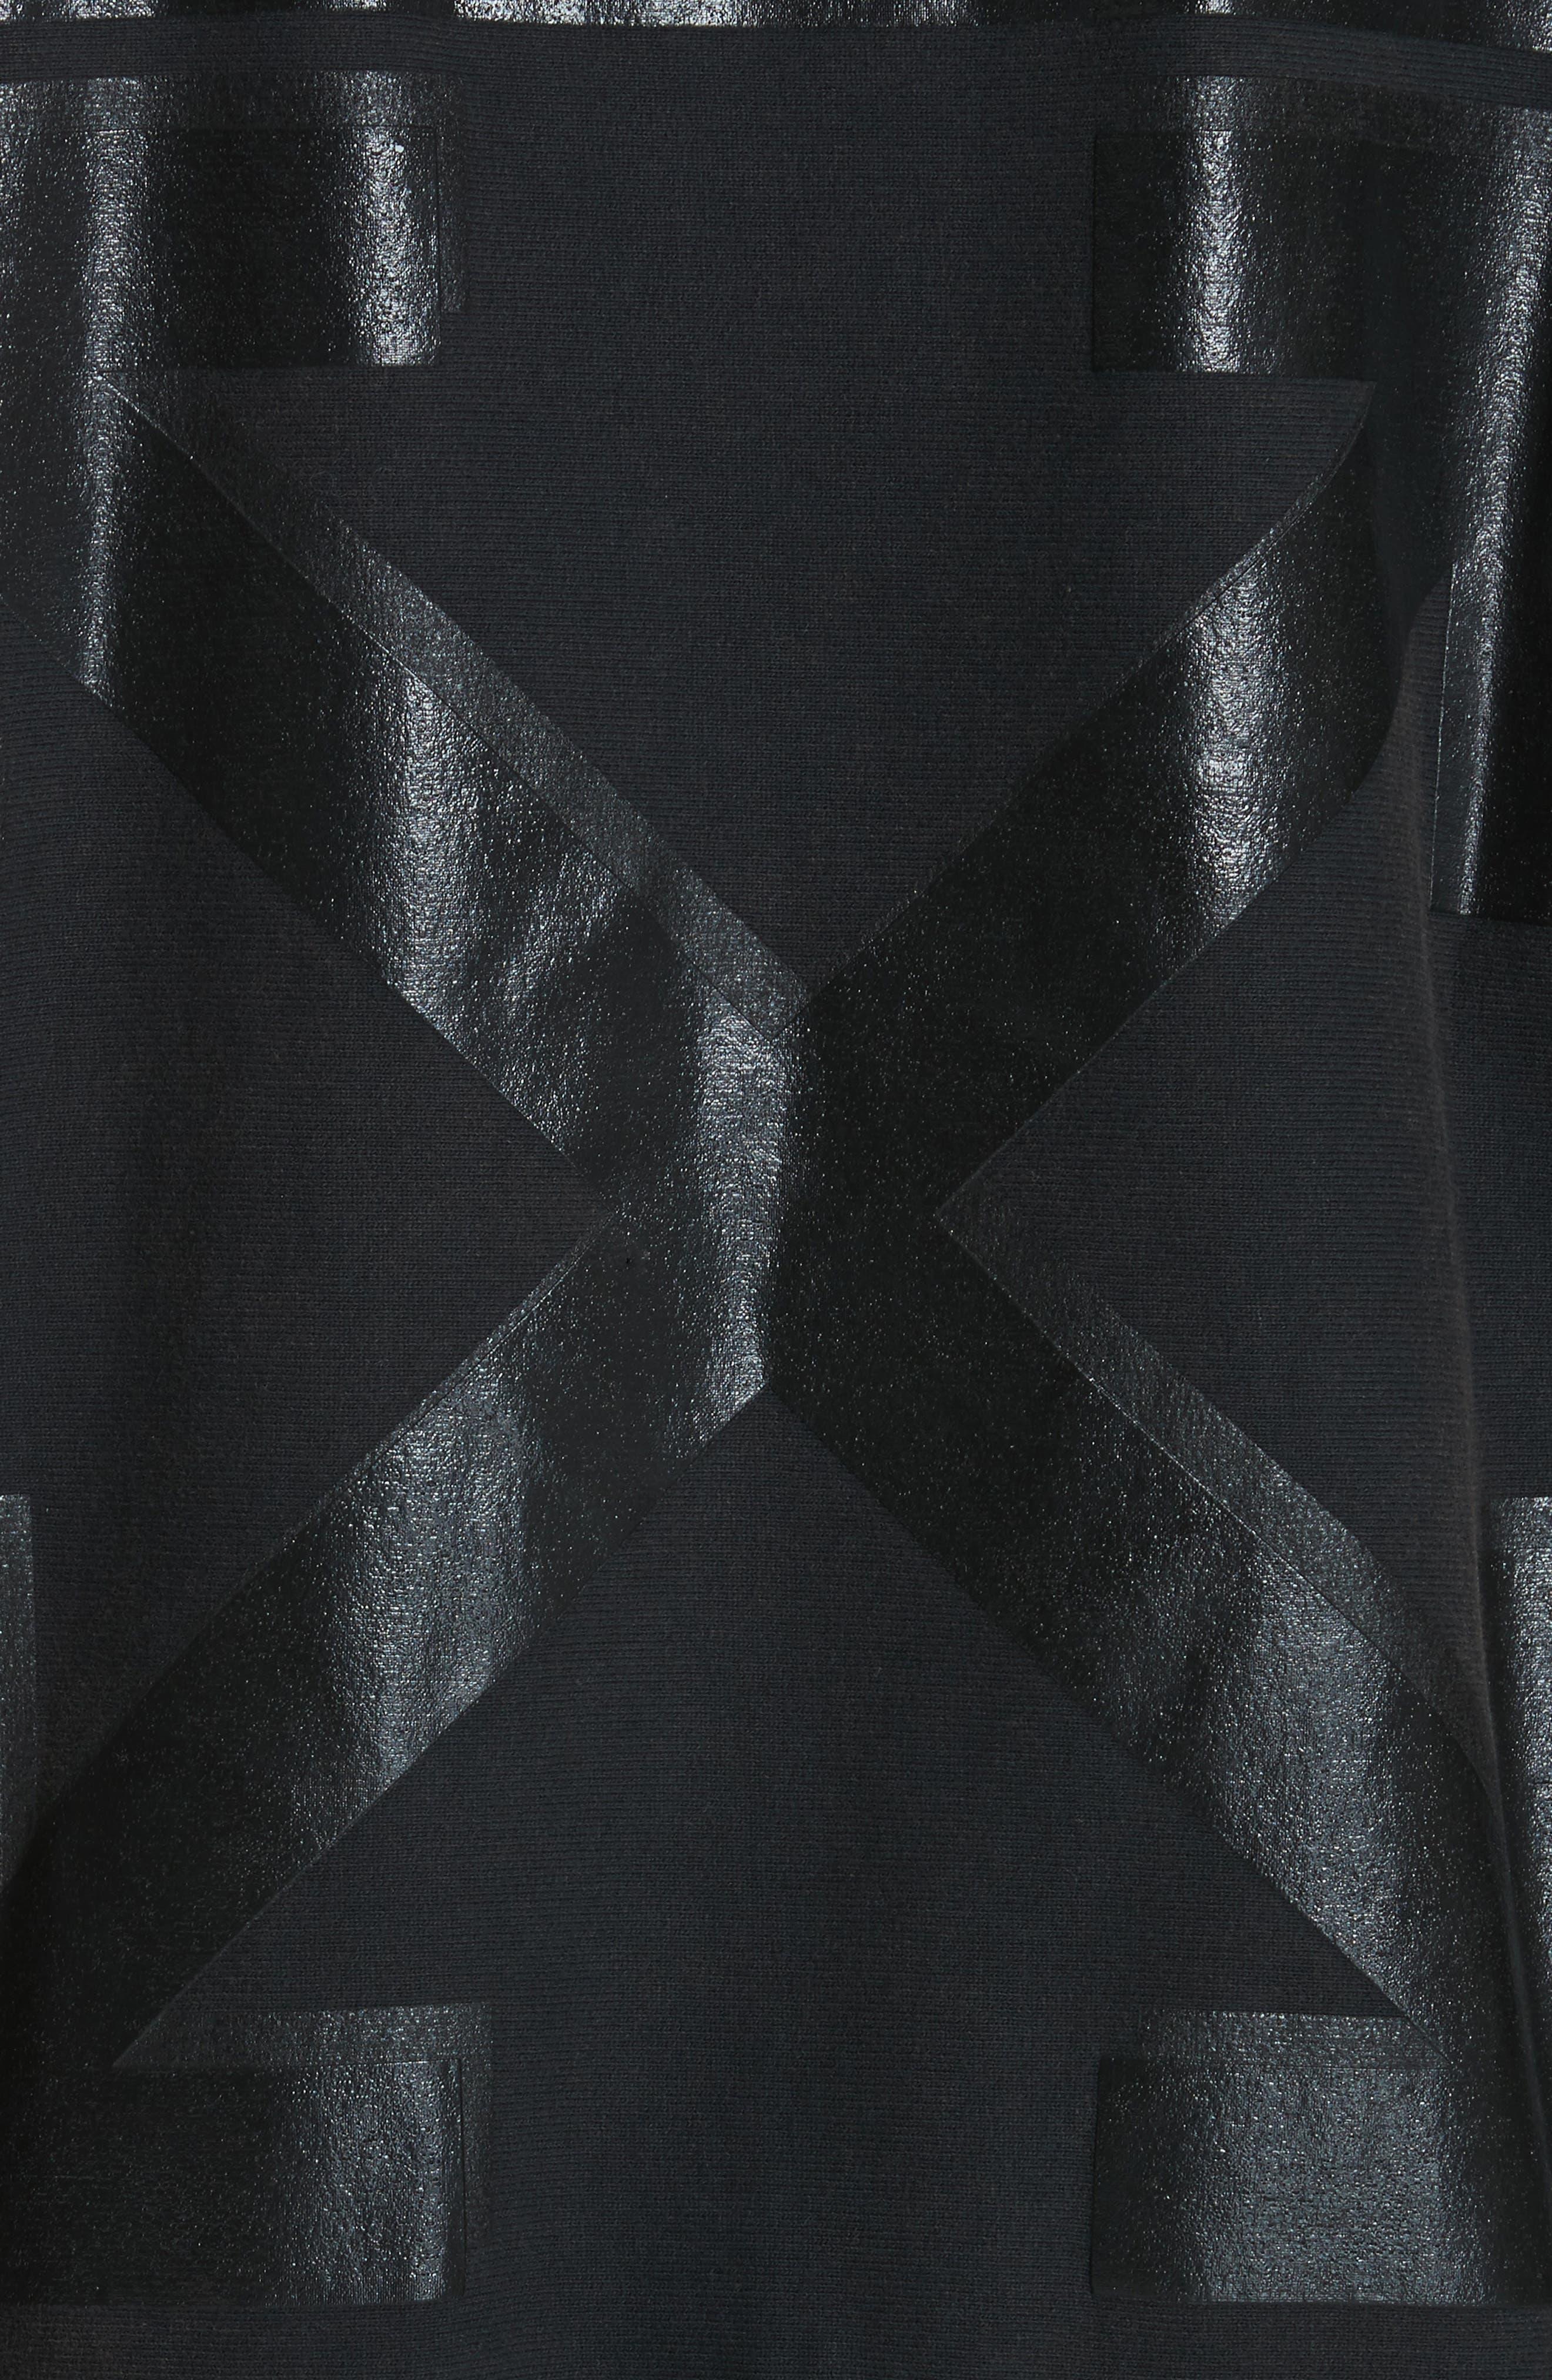 x Champion Pullover Hoodie,                             Alternate thumbnail 5, color,                             Black/ Black